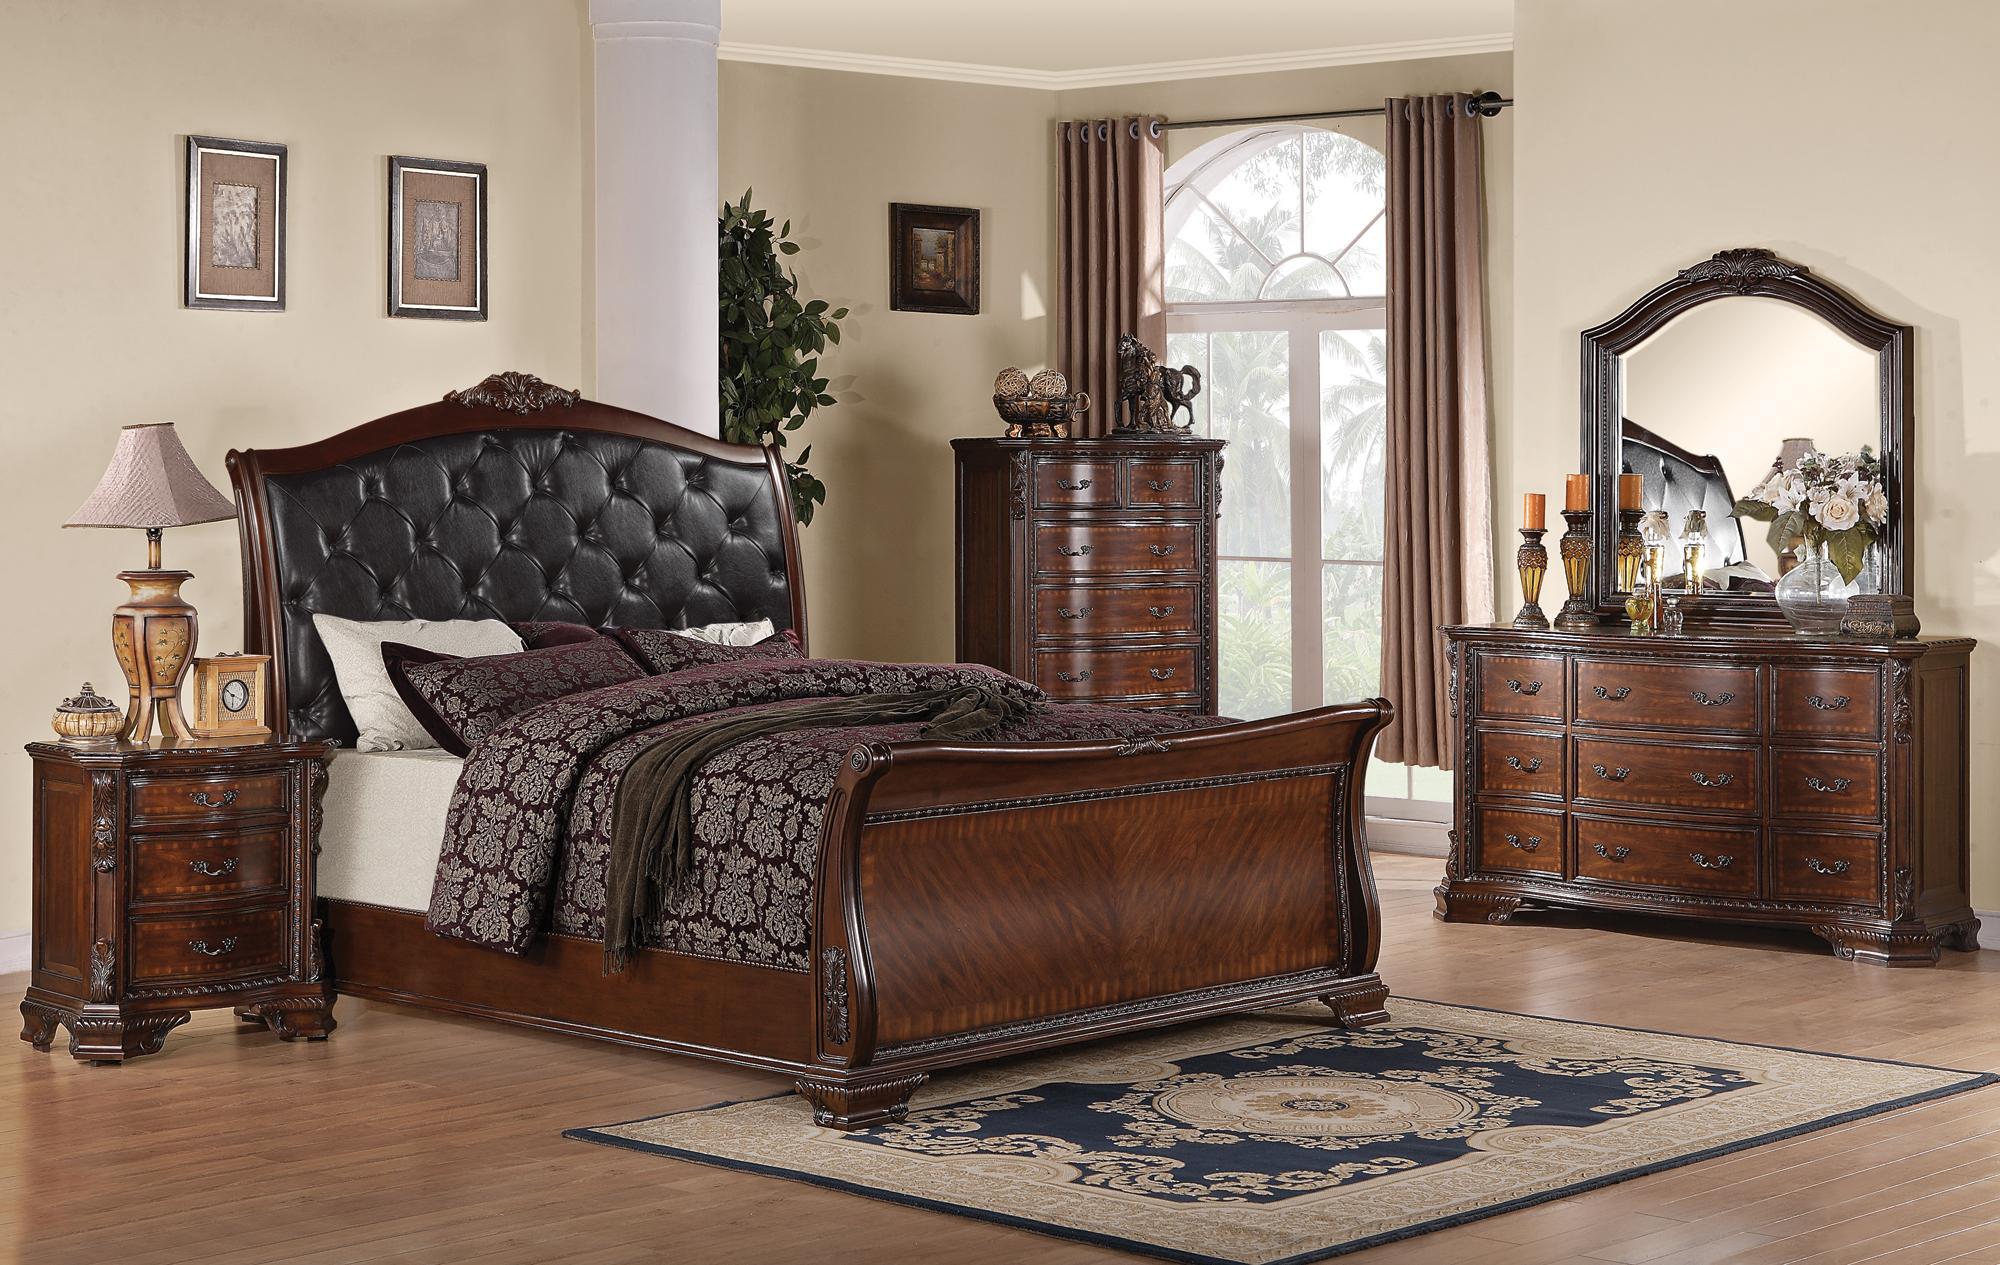 Maddison Sleigh Upholstered Bedroom Set from Coaster 202261